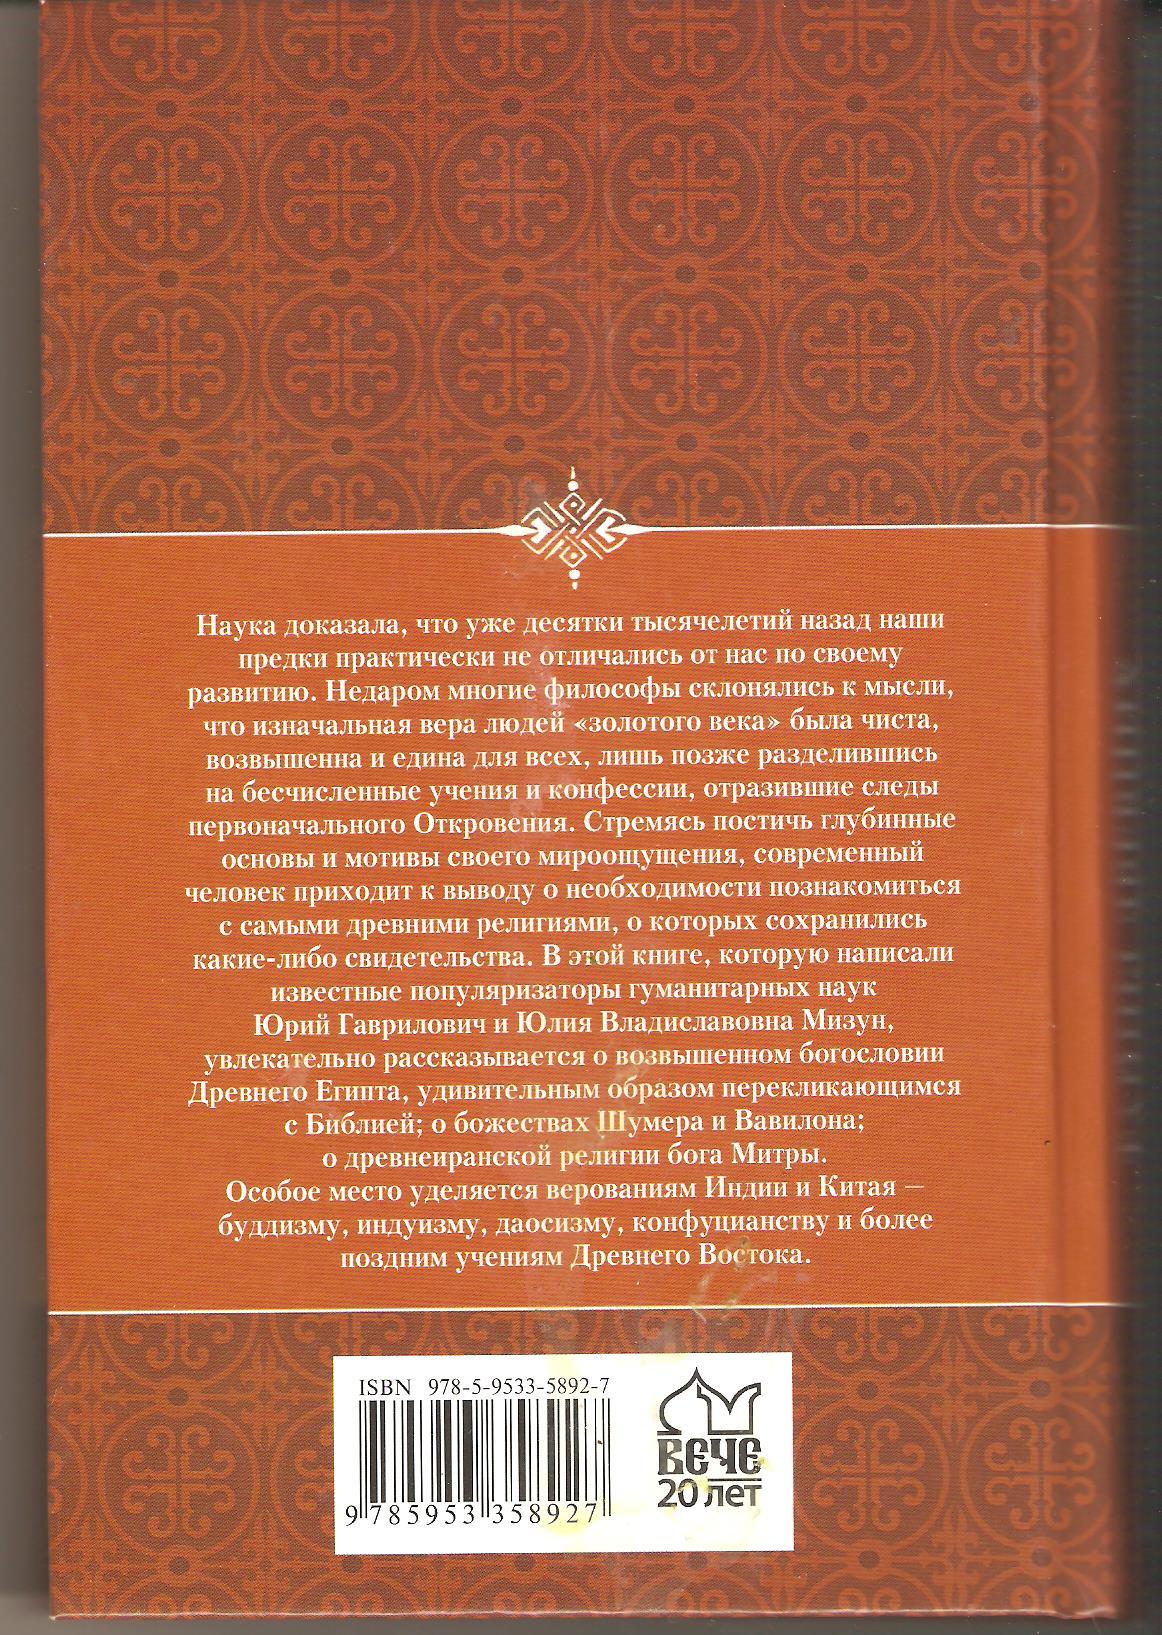 Тайны древних религий 002.jpg